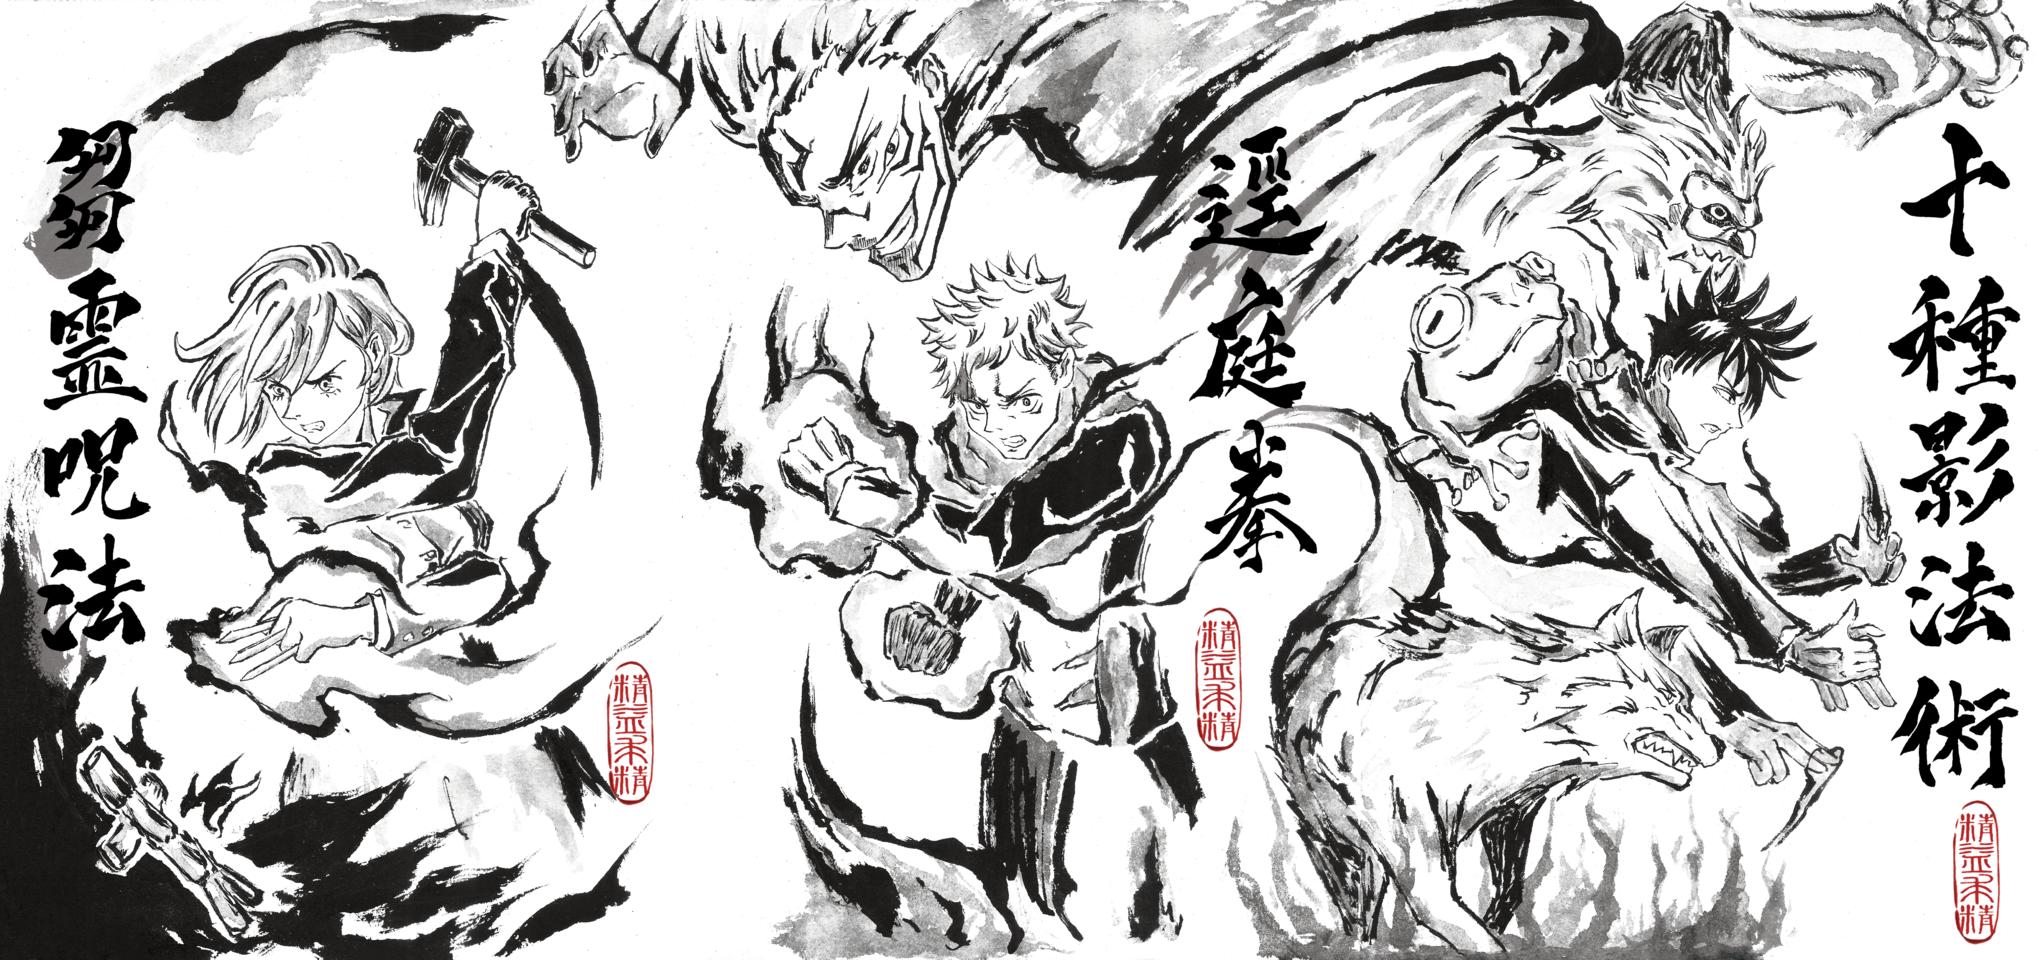 Jujutsu Kaisen Freshmores Illust of Hontonikireidesu JujutsuKaisenFanartContest Yuji_Itadori JujutsuKaisen Megumi_Fushiguro Nobara_Kugisaki